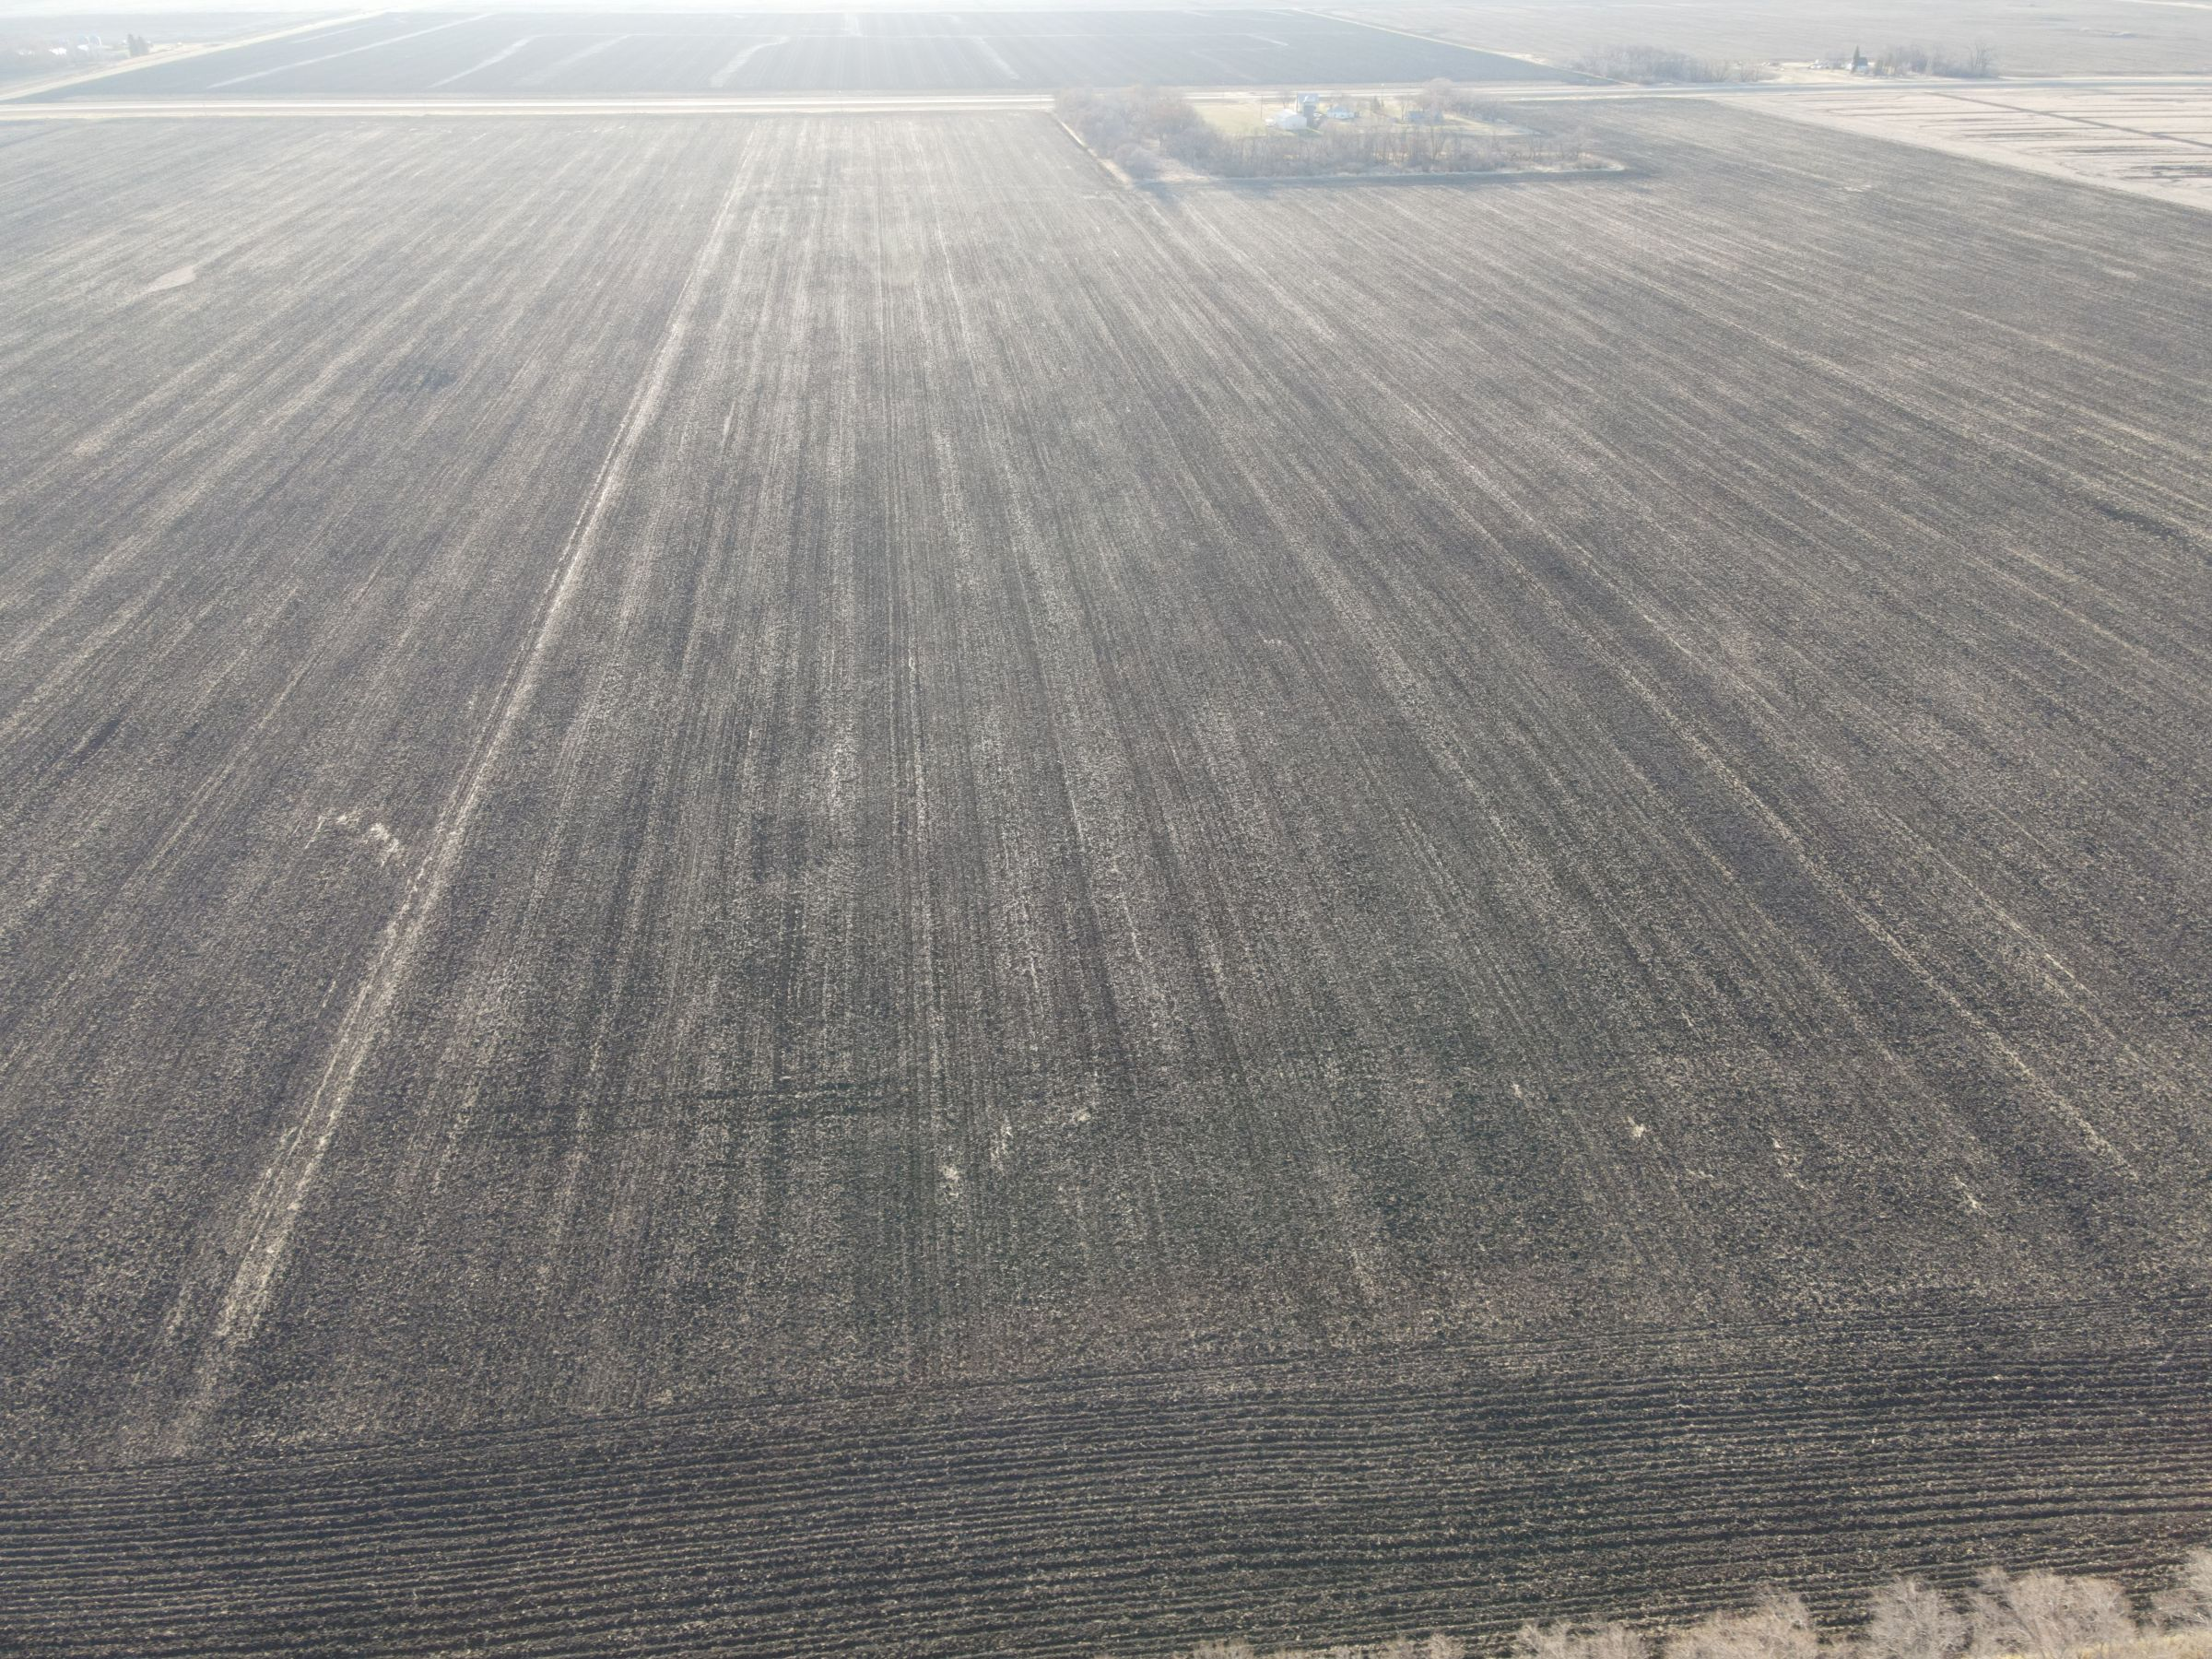 traill-county-north-dakota-74-acres-listing-number-15607-2-2021-06-22-201955.JPG